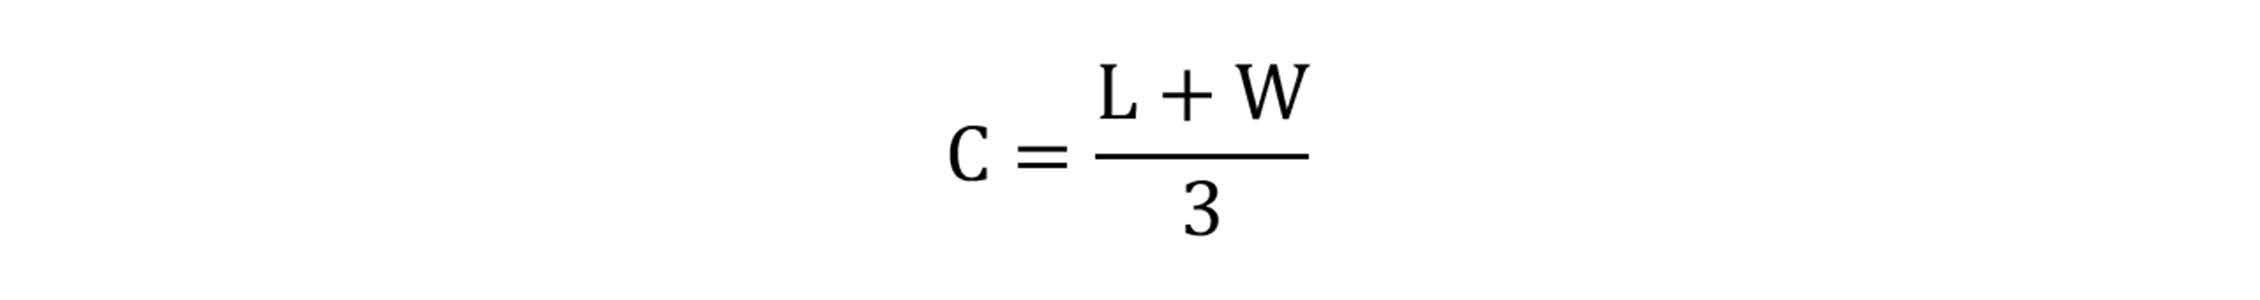 Caster Capacity Rule of 3 Formula